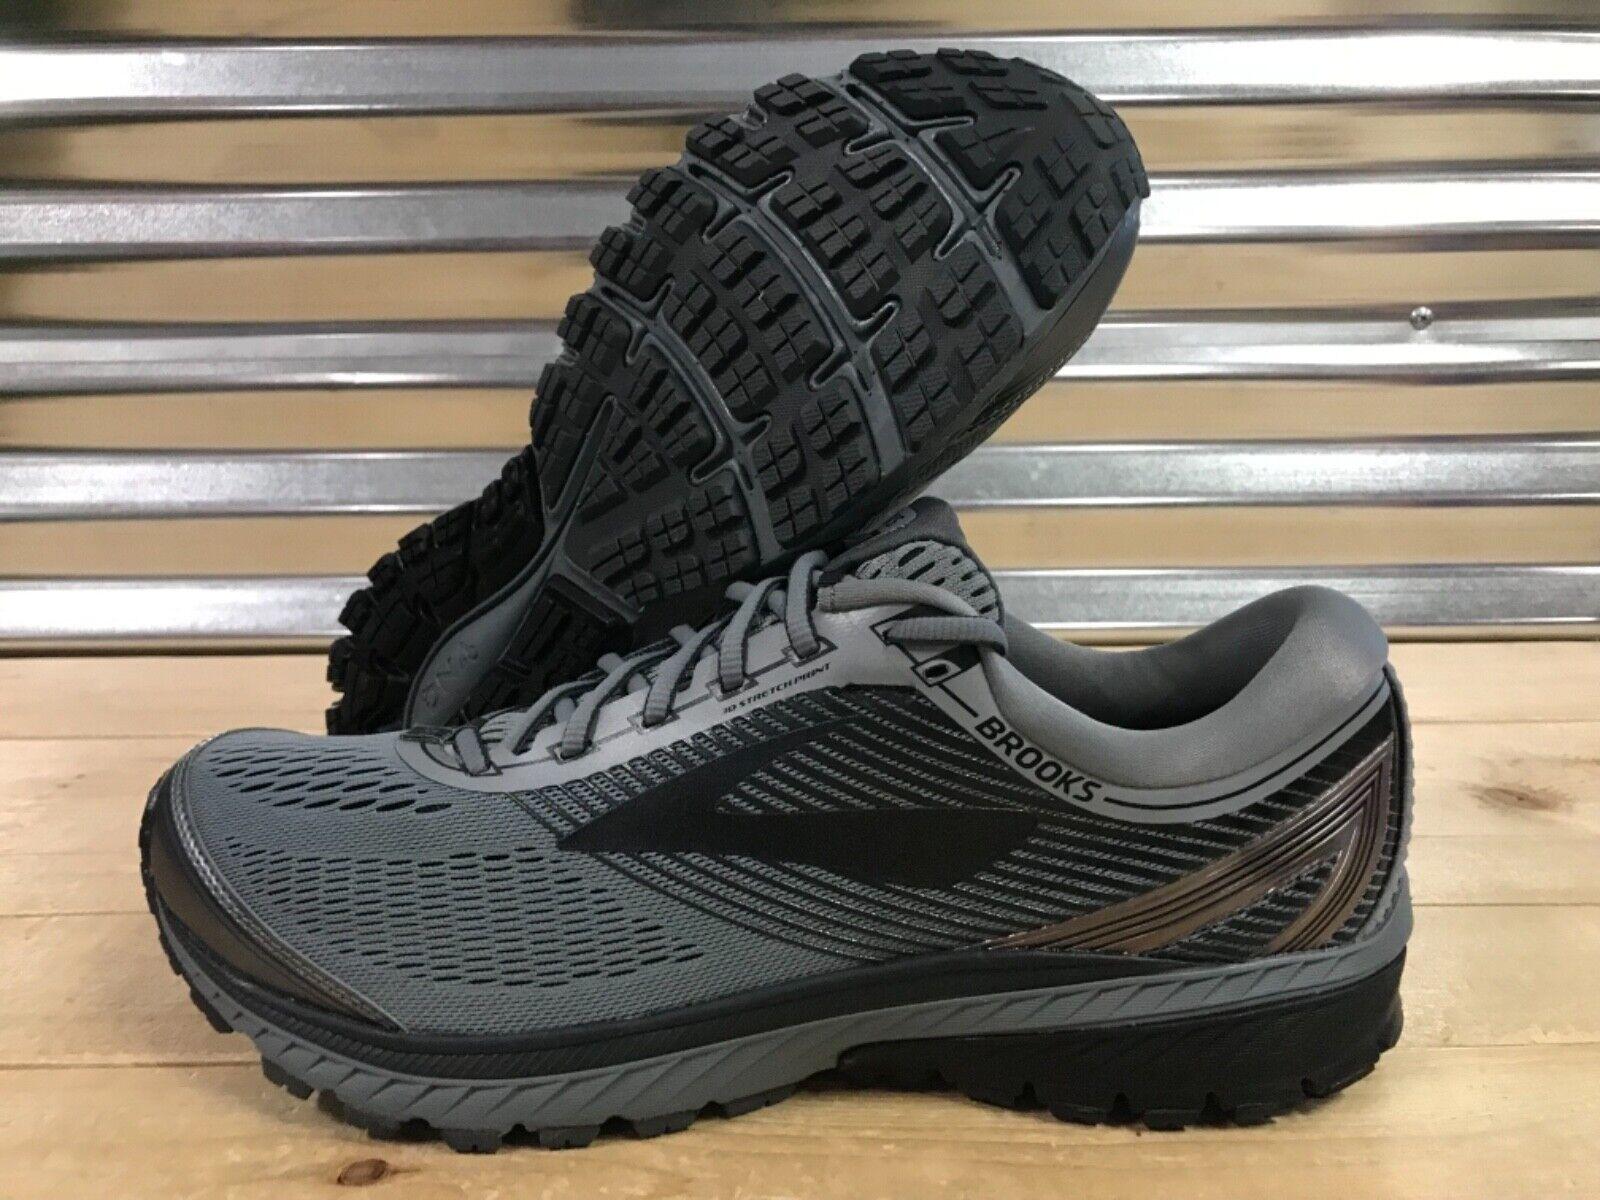 Brooks Ghost 10 Running shoes DNA 3M Dark Grey Black SZ ( 1102571D034 )